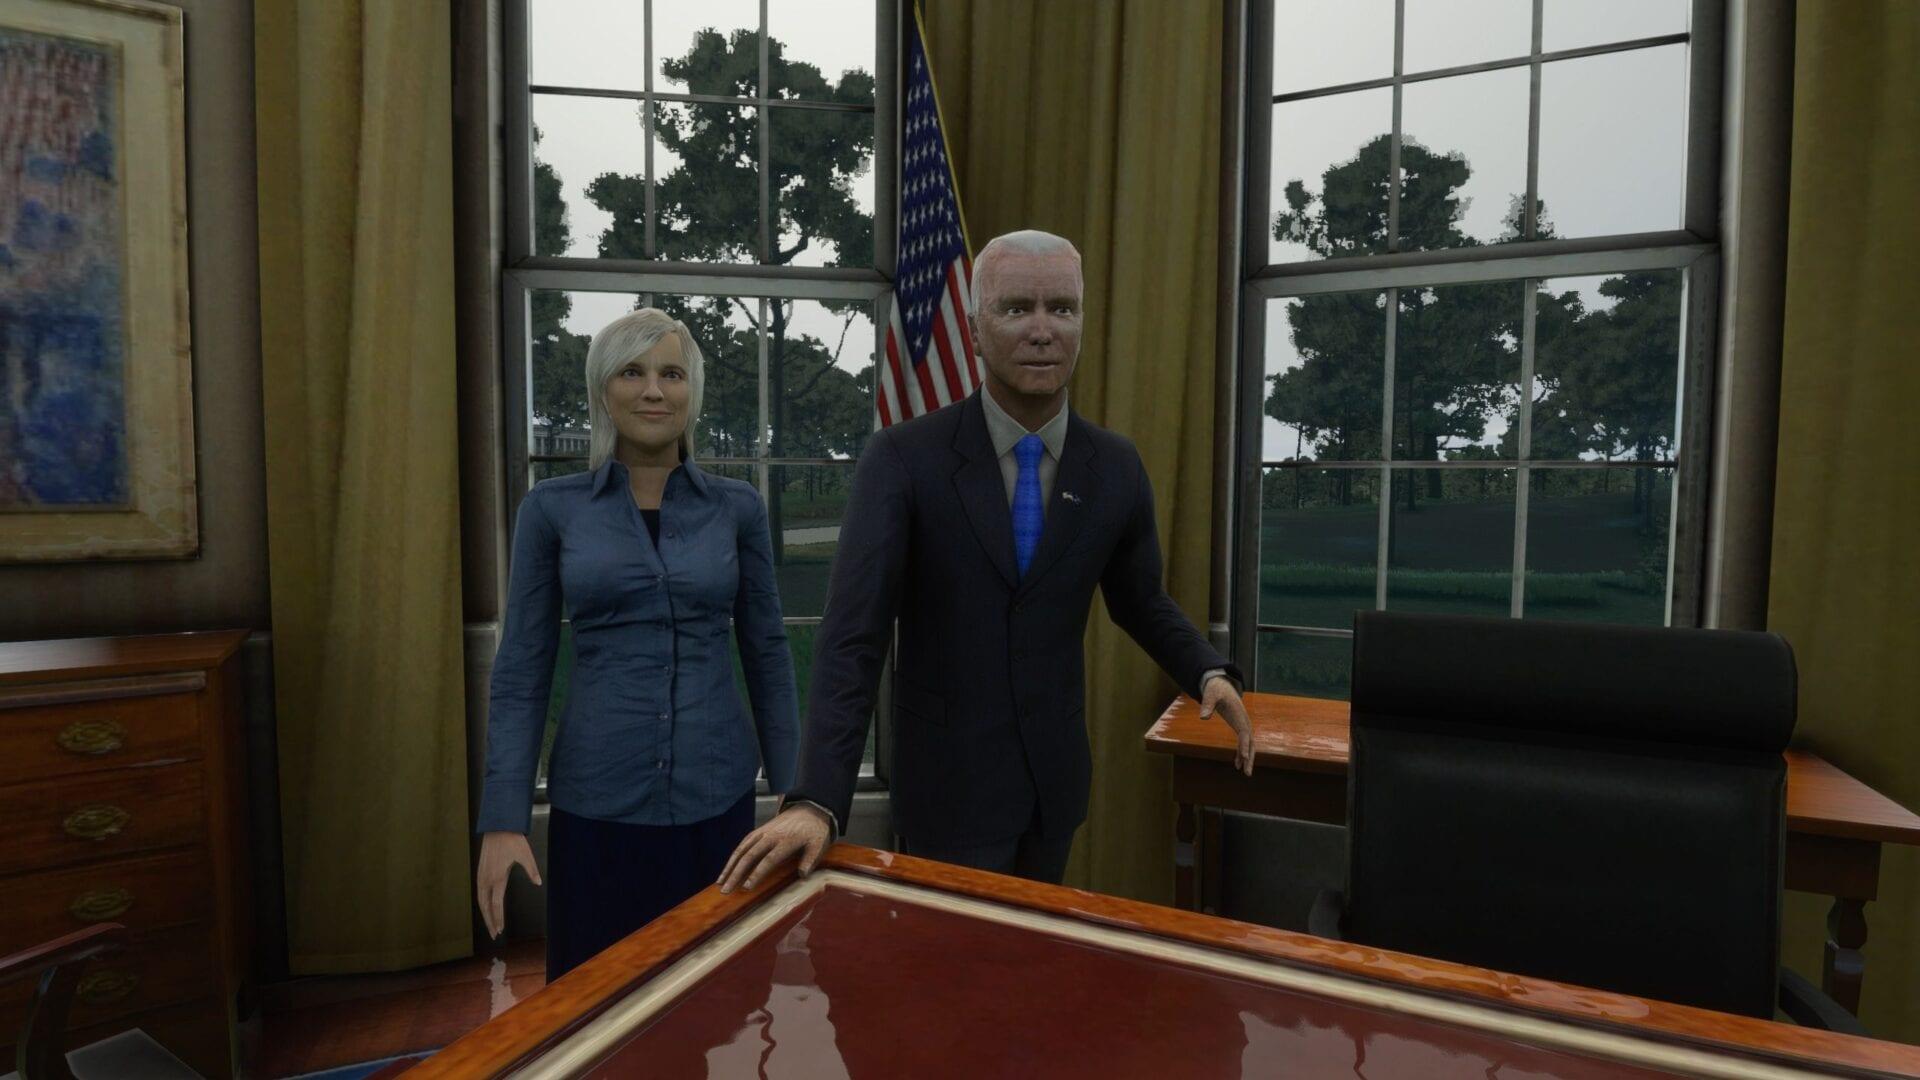 Micrfosoft Flight Simulator Joe Biden